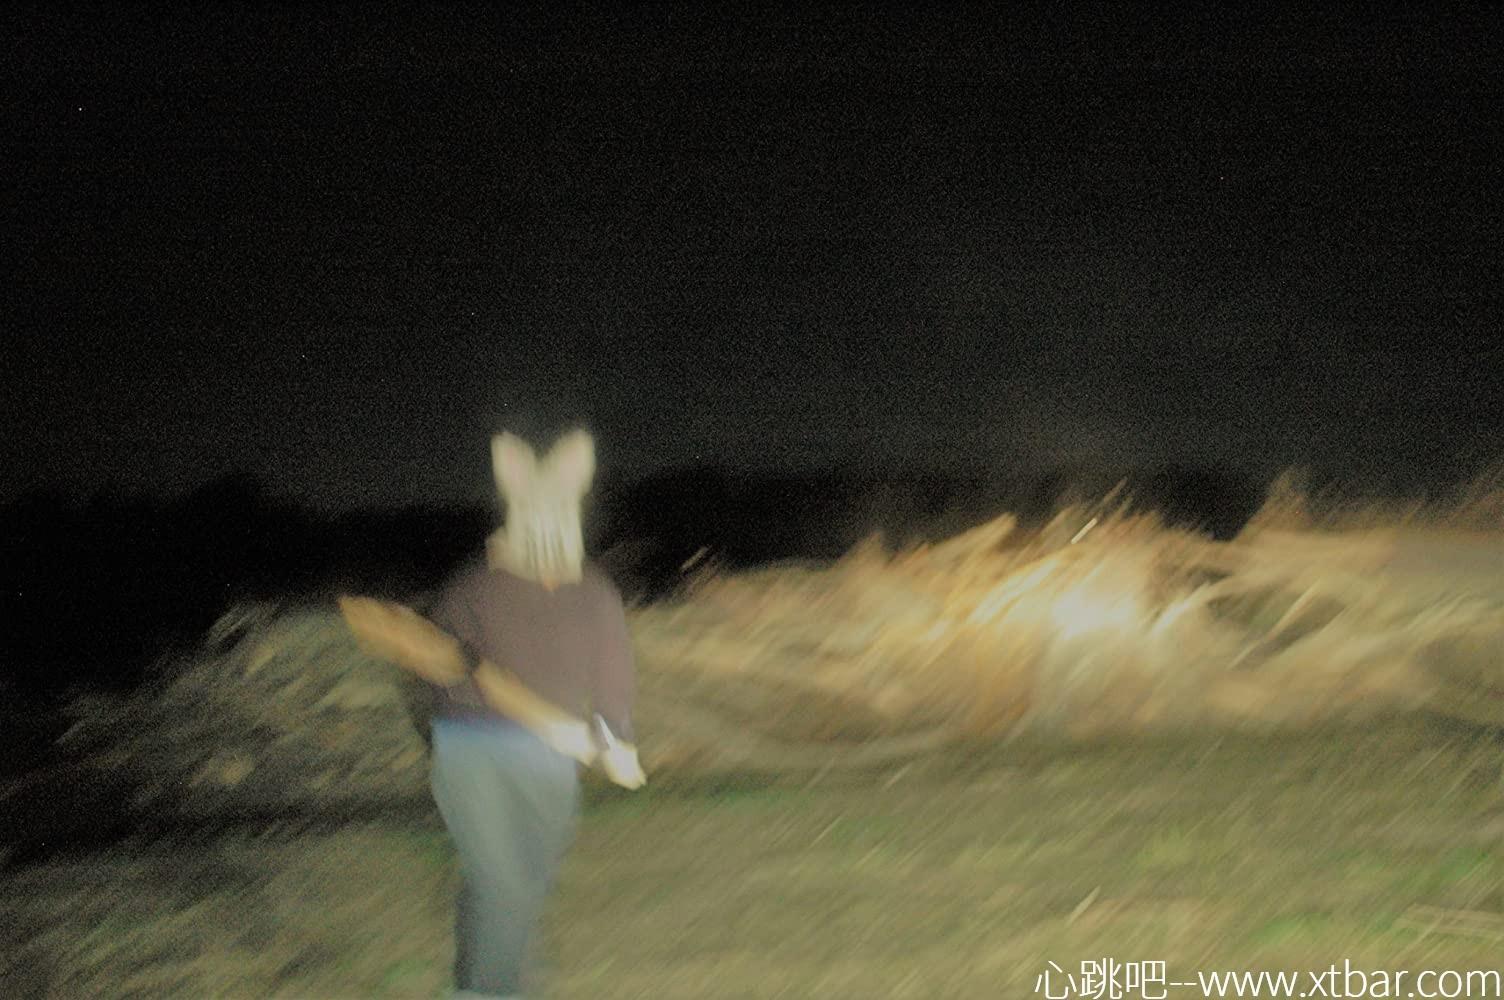 0085j6oIly1ghg9g9f8iqj315s0rsteu - [欧美都市传说]:兔子男Bunny Man,小兔子乖乖一点也不可爱